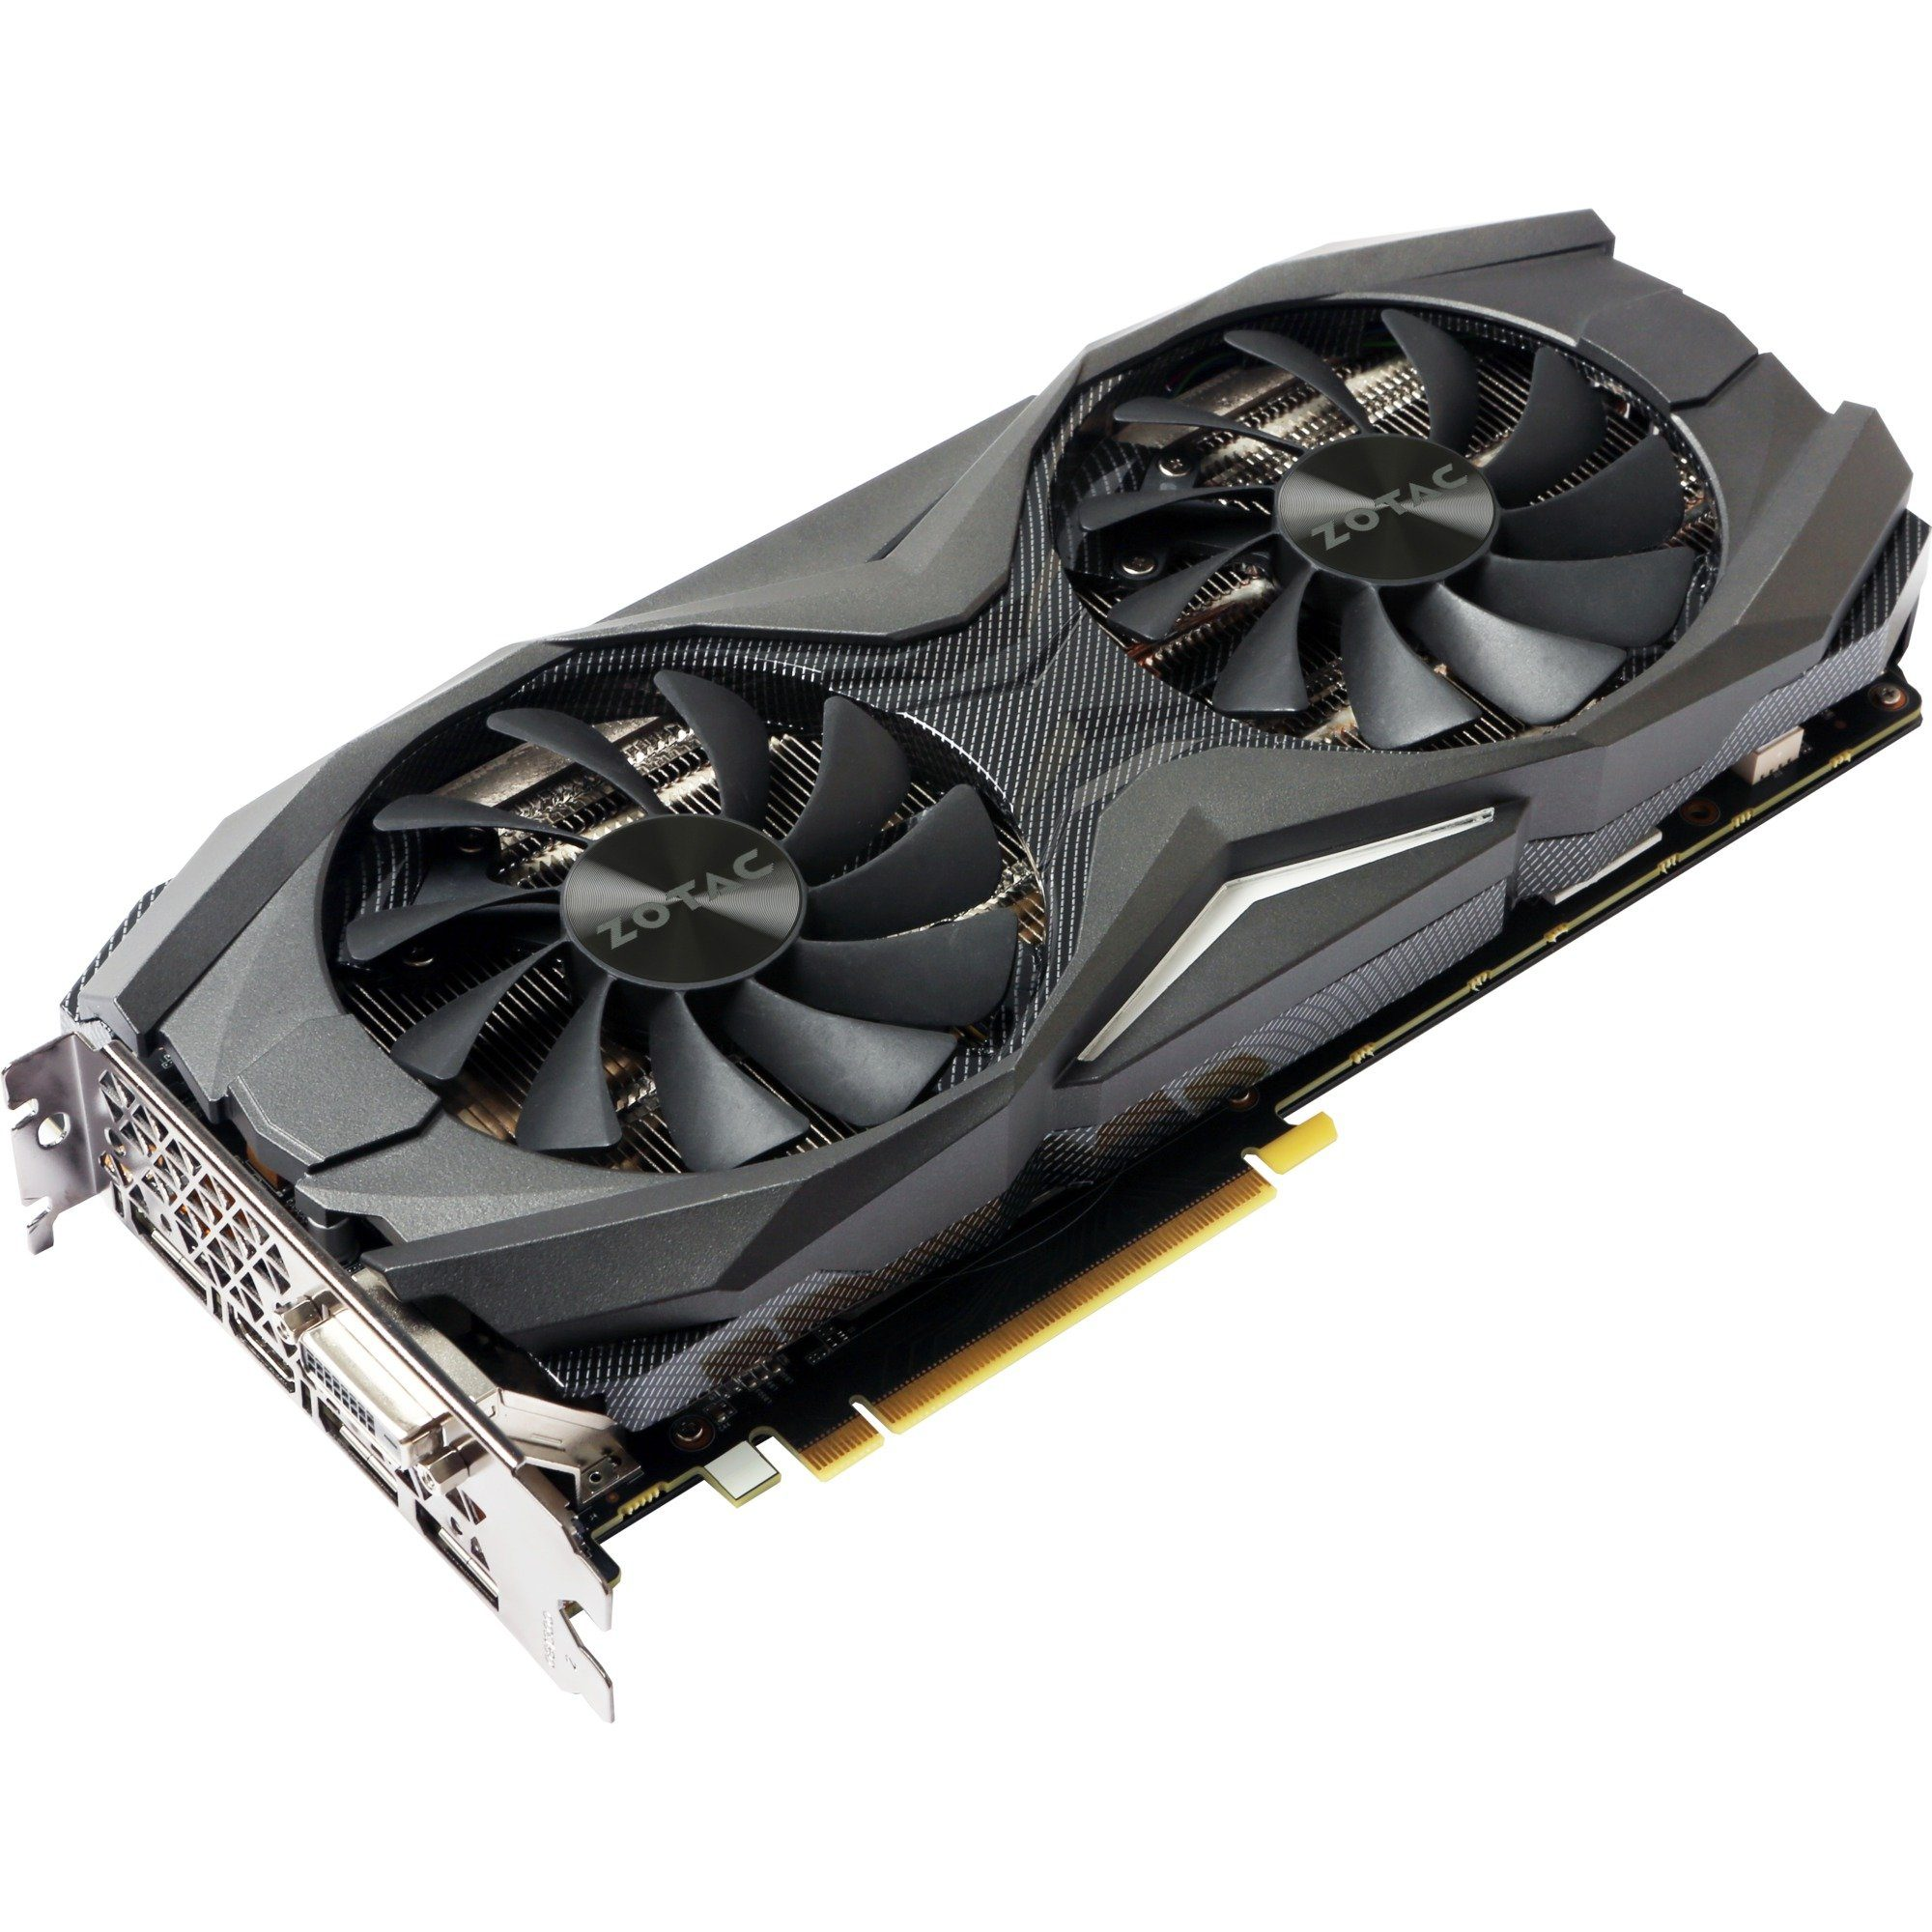 ZOTAC Grafikkarte »GeForce GTX 1080 AMP! Edition«